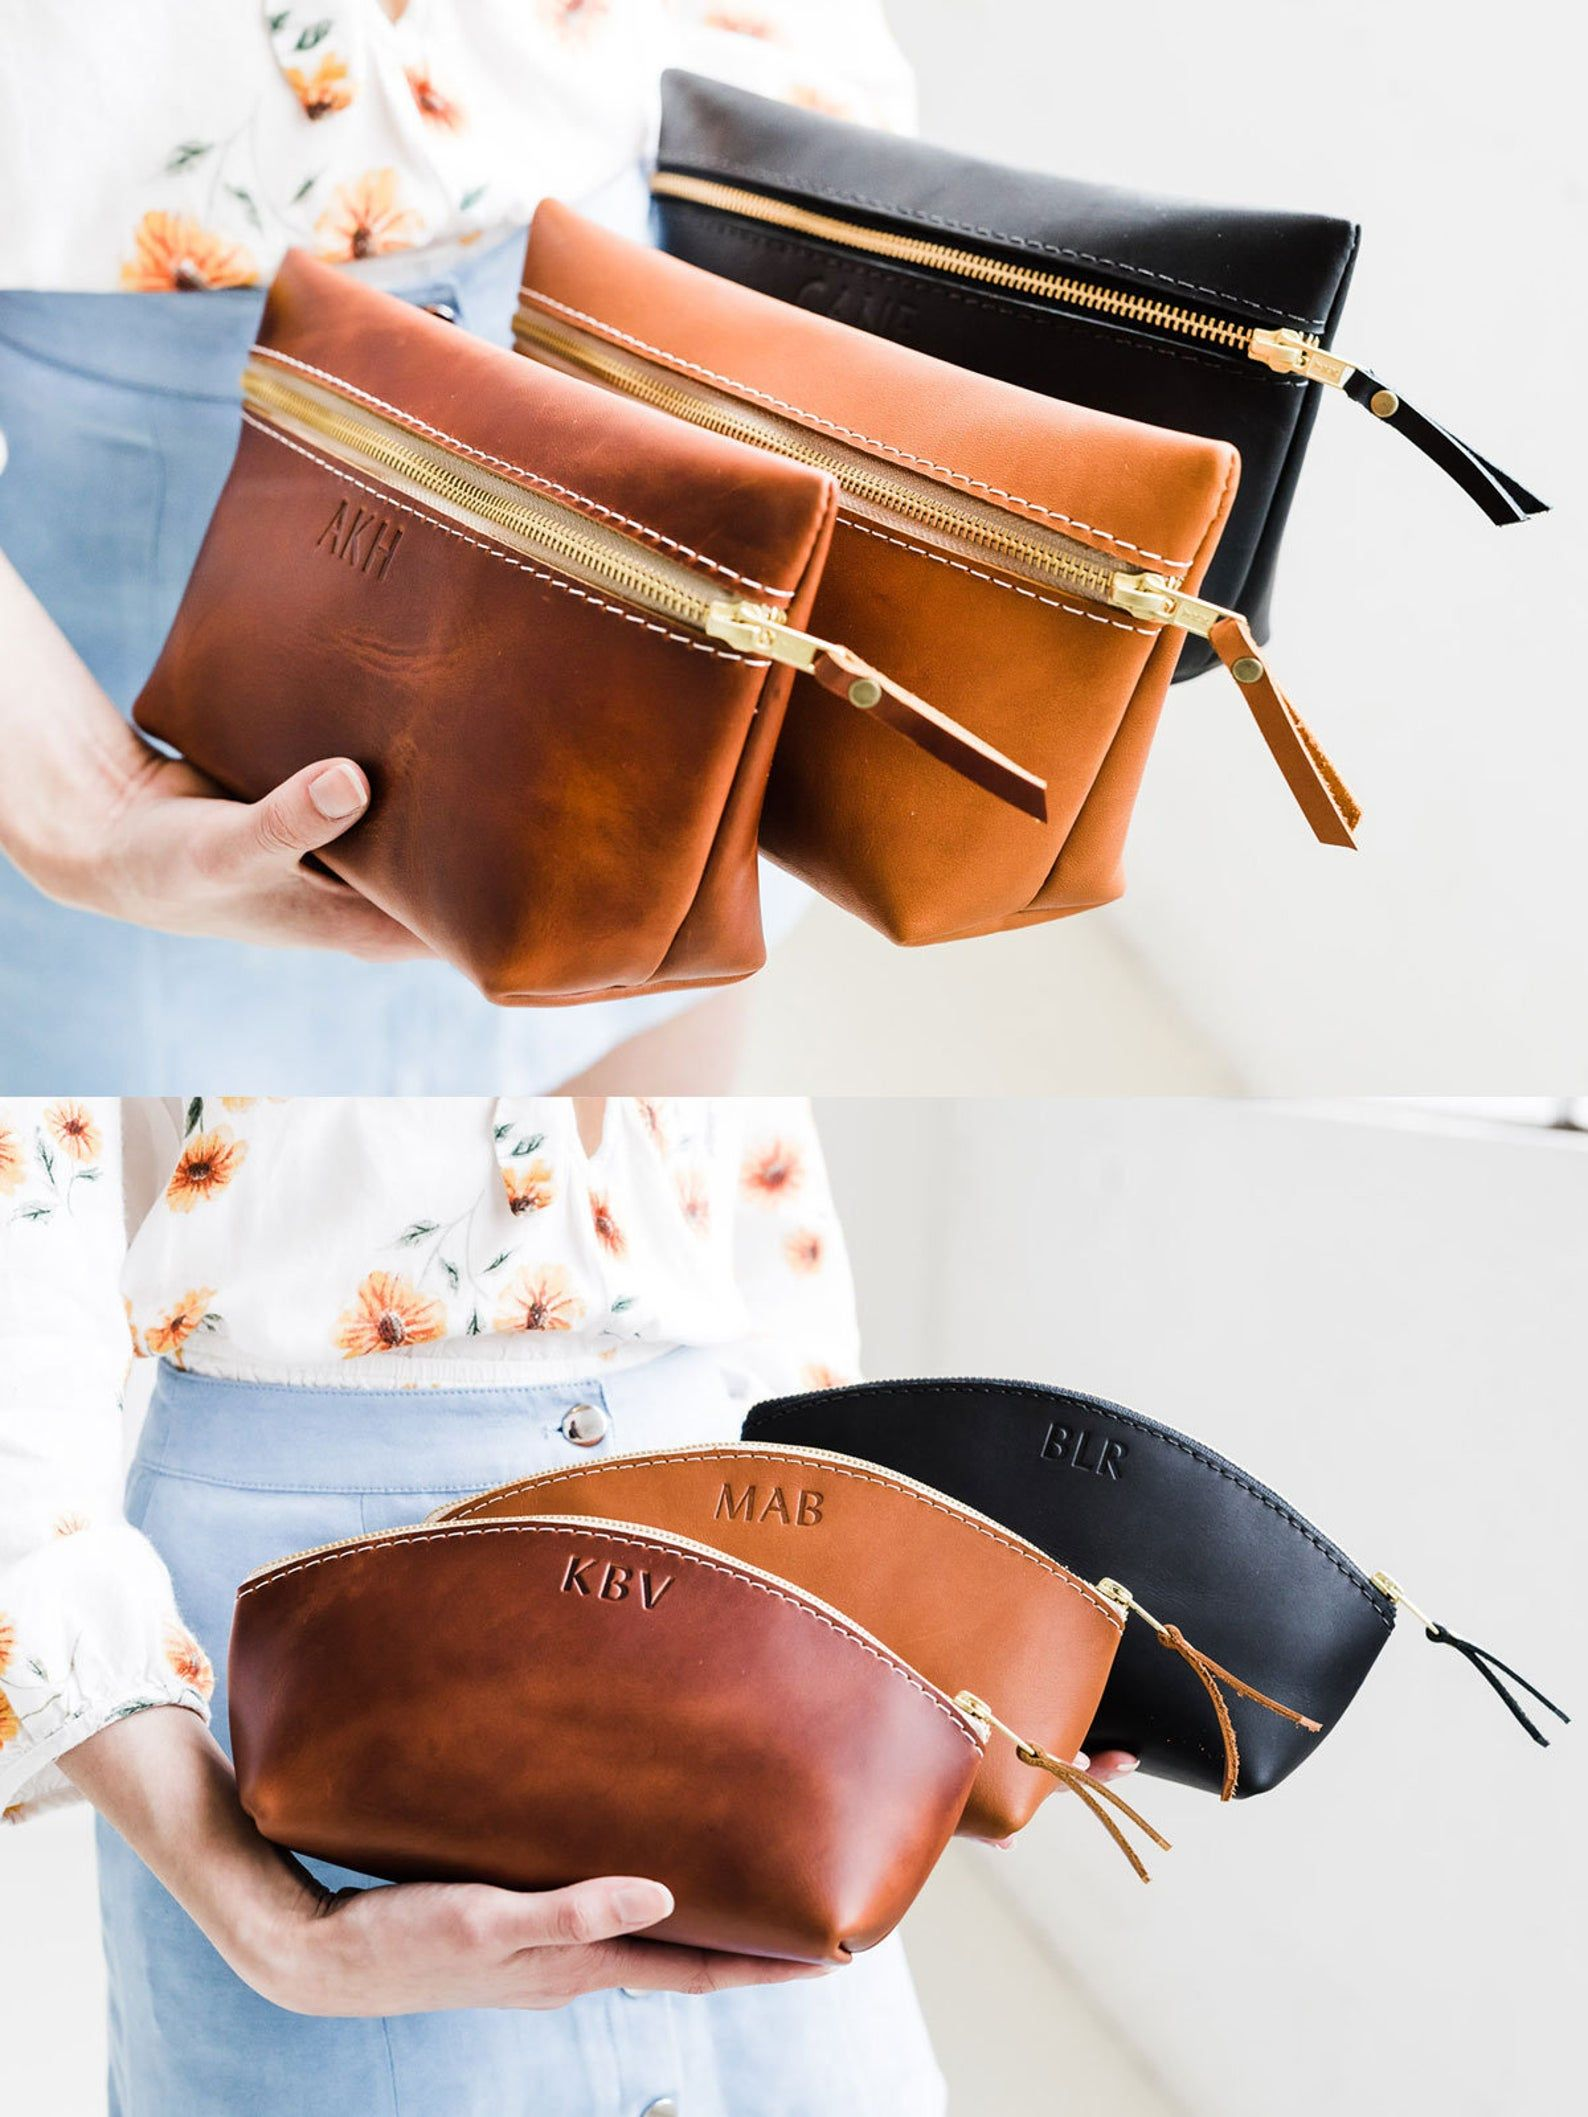 Makeup Bag Custom Leather Bag with Monogram Women's image